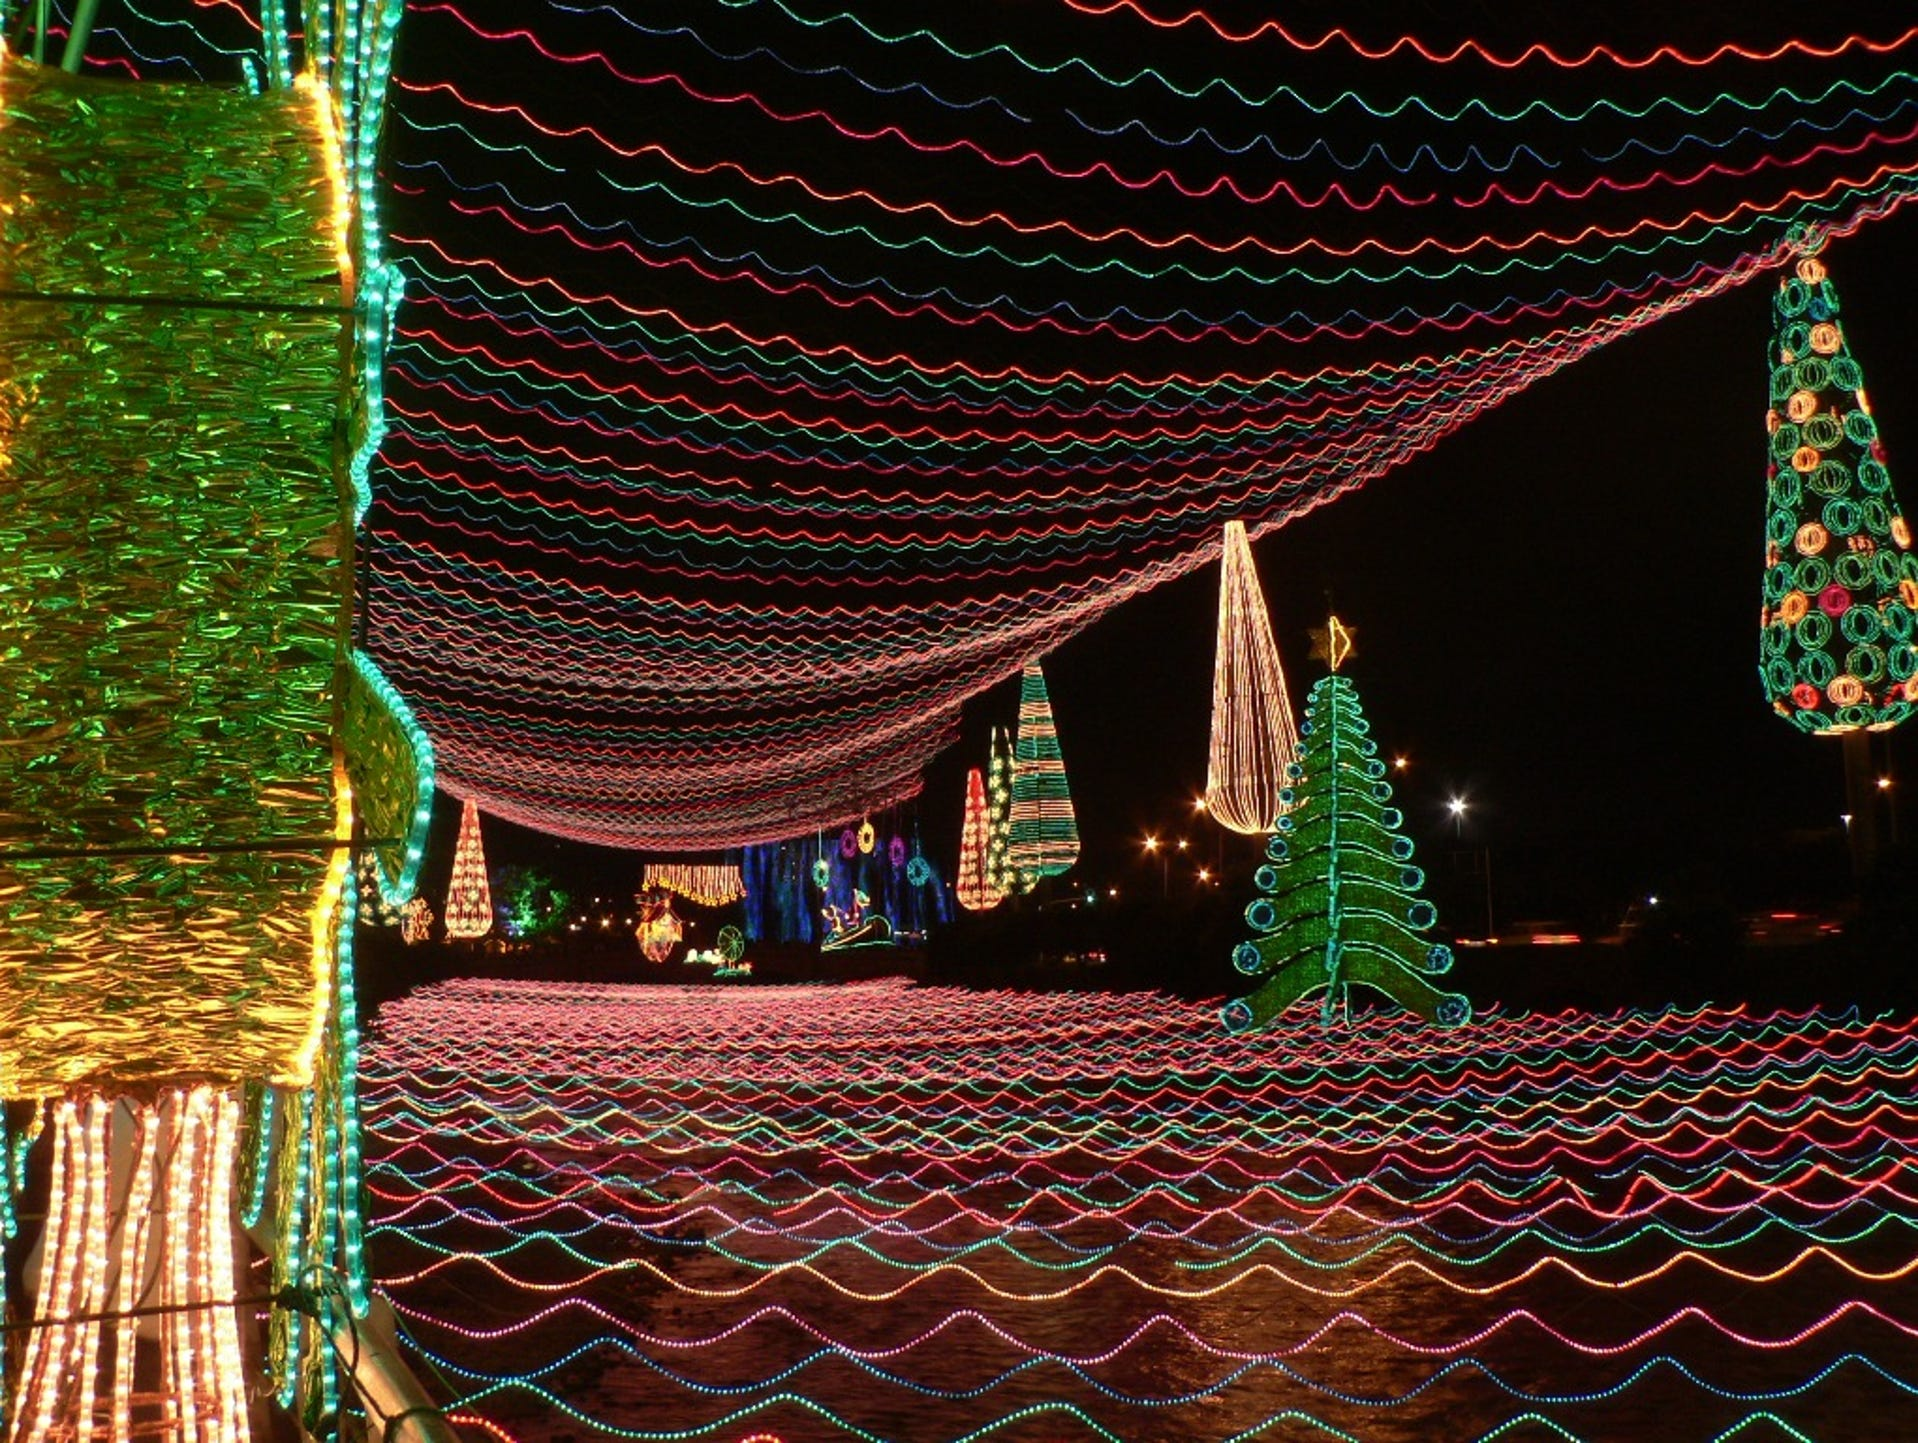 A beloved event, the Lighting of Medellín has been